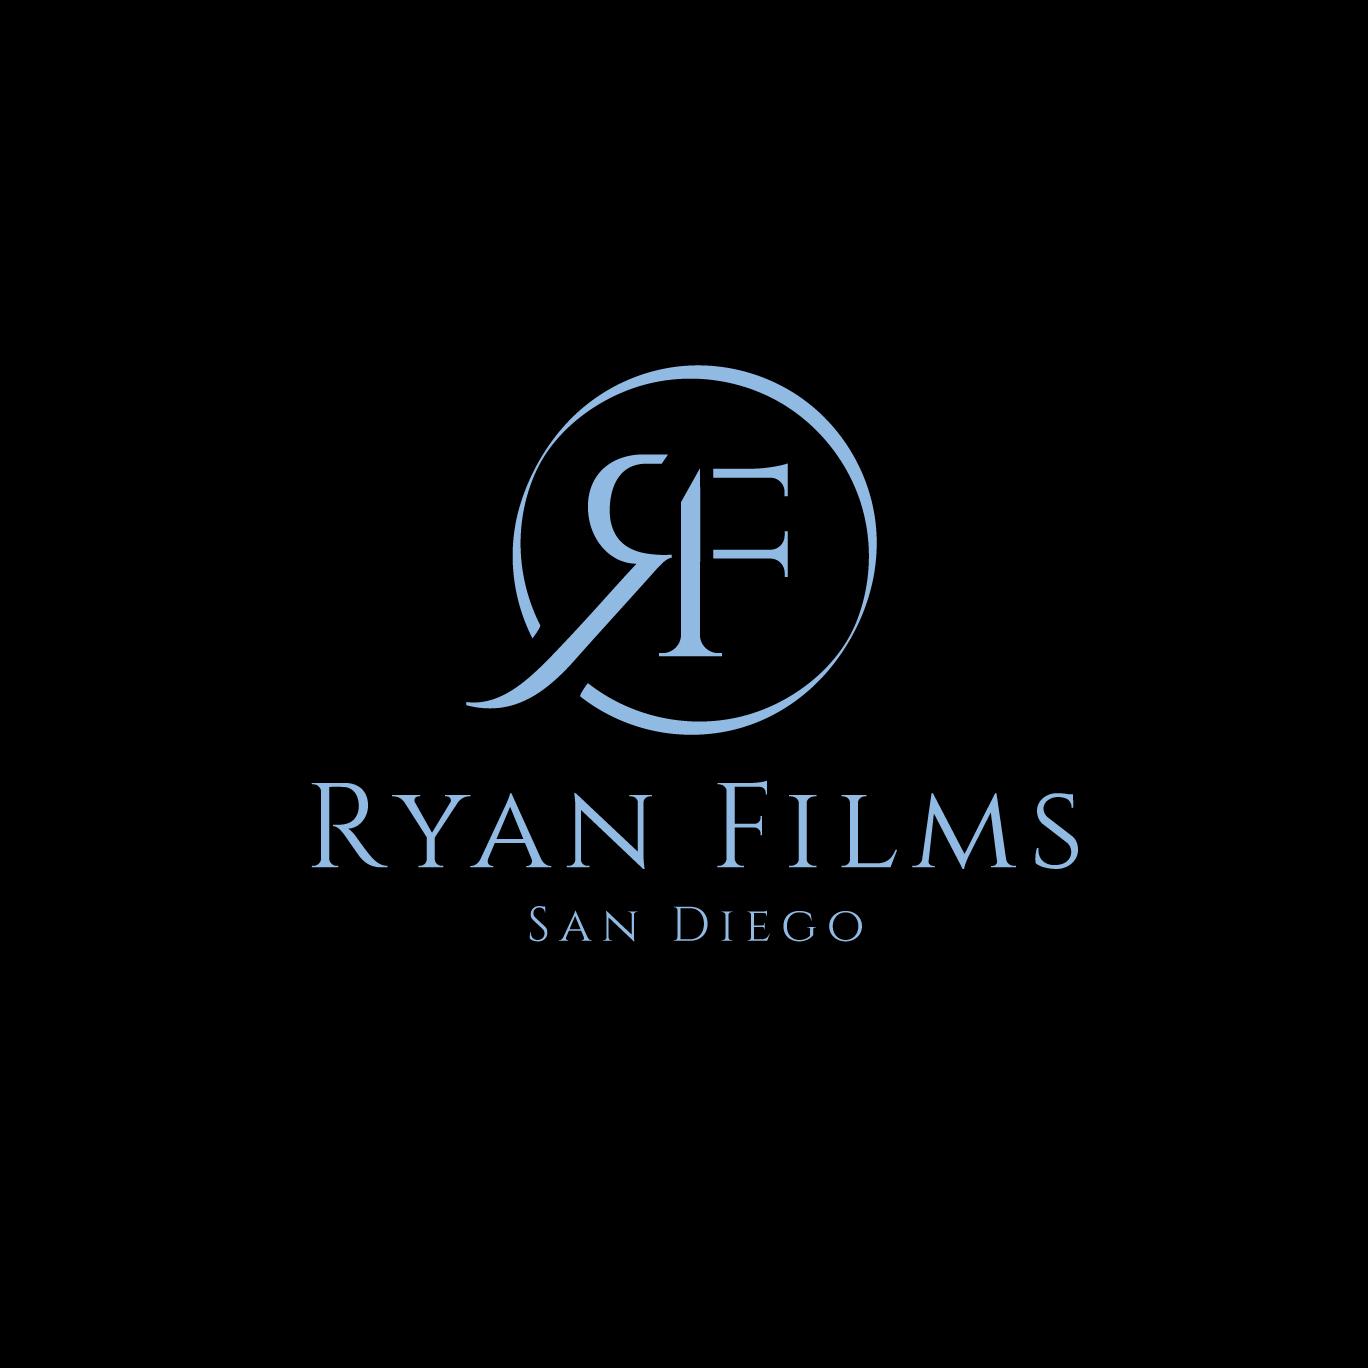 Professional Masculine Wedding Photography Logo Design For Ryan Films San Diego By Univdesigners Design 17080498